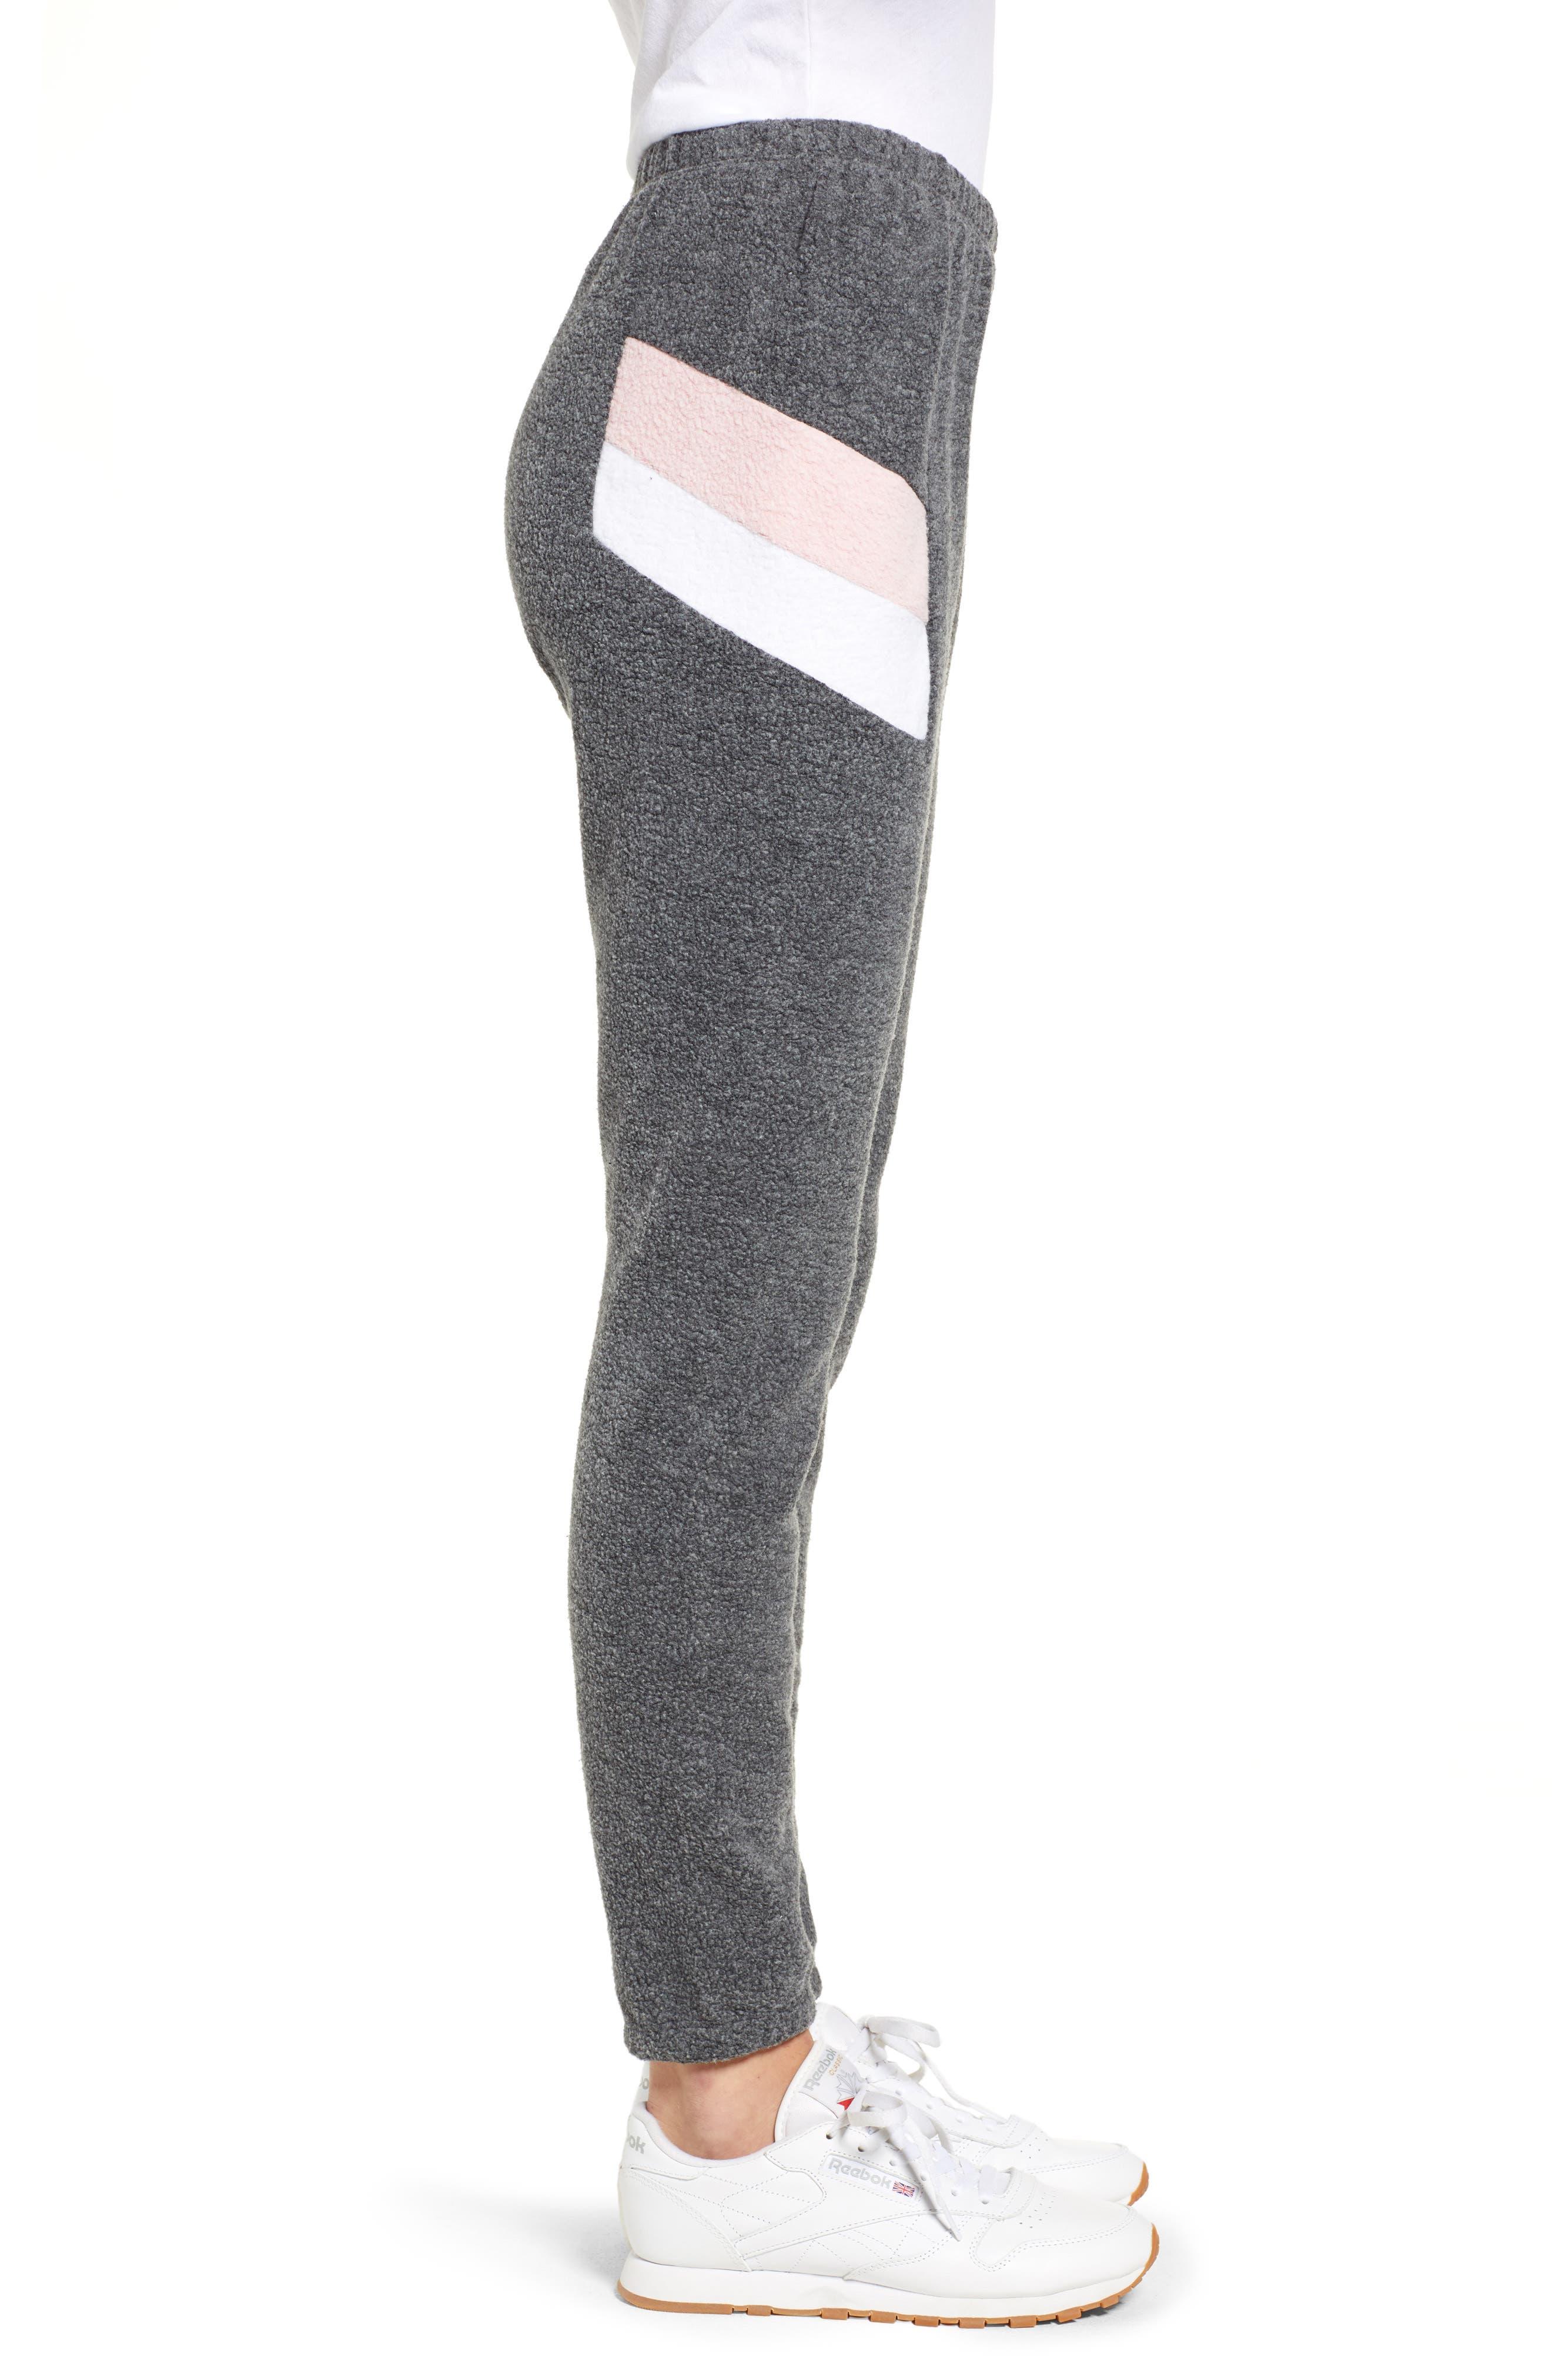 Knox Sweatpants,                             Alternate thumbnail 3, color,                             CLEAN BLACK